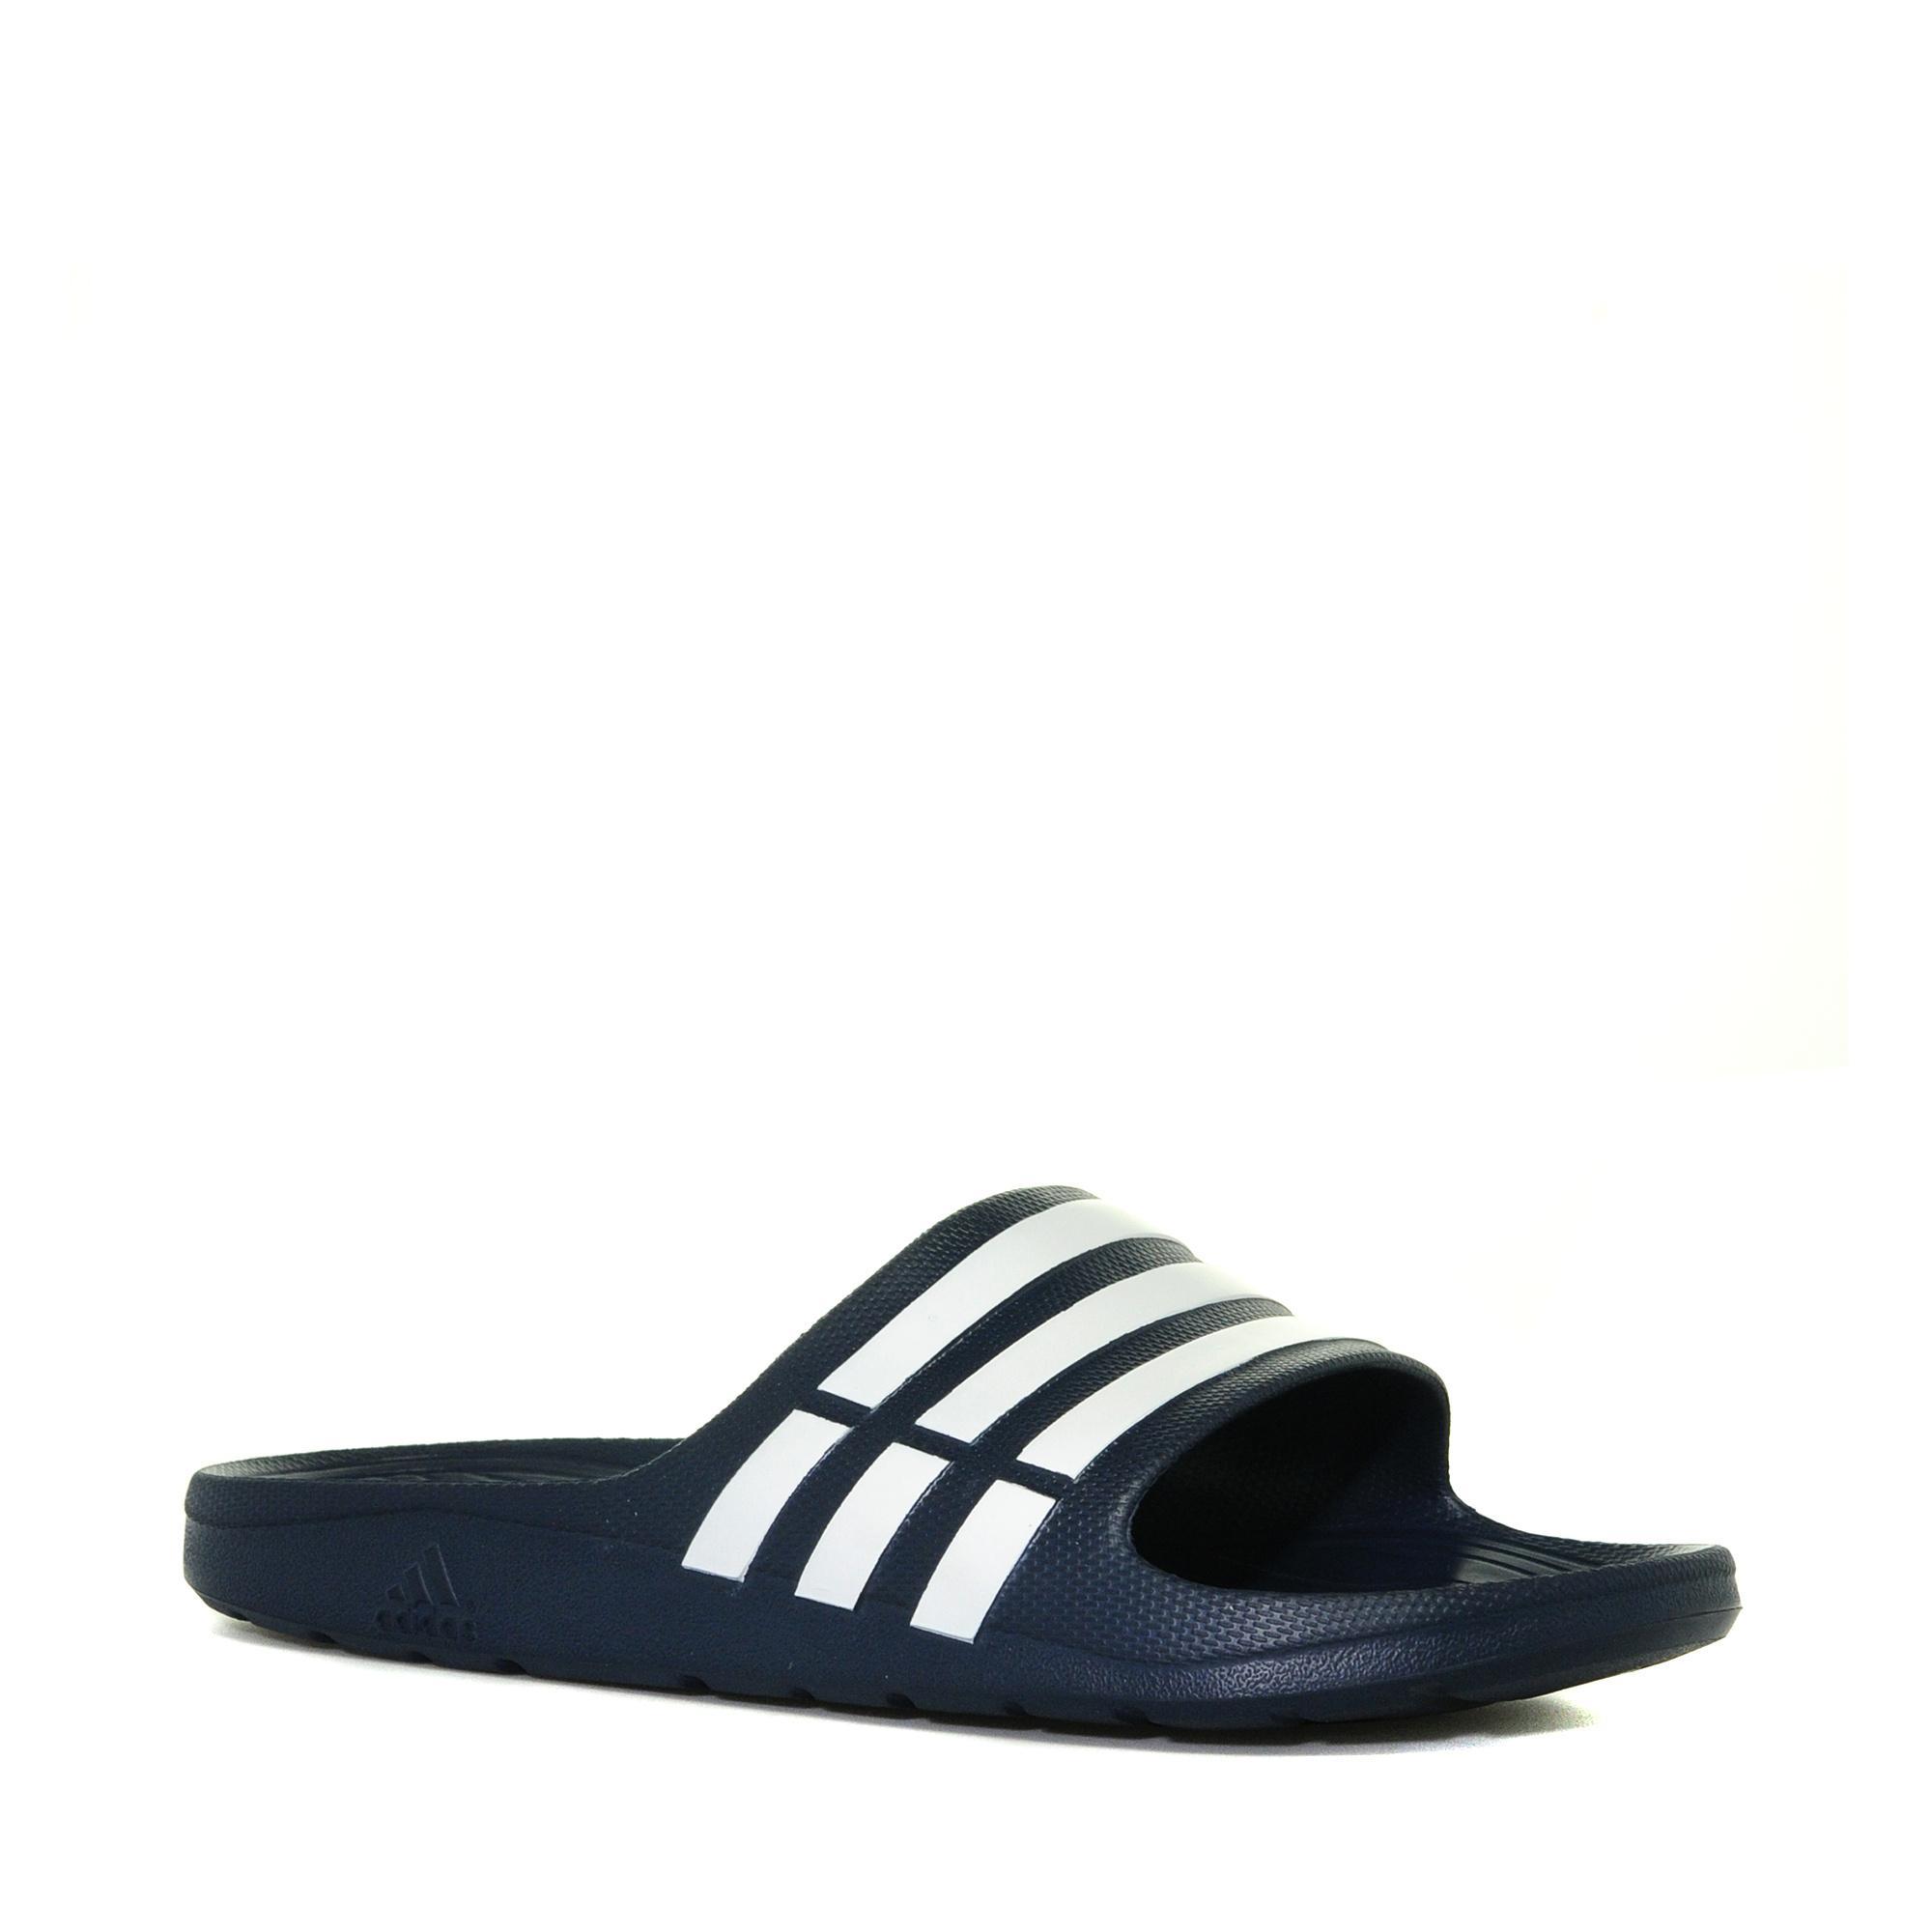 Adidas Mens Duramo Flip Flops Navy